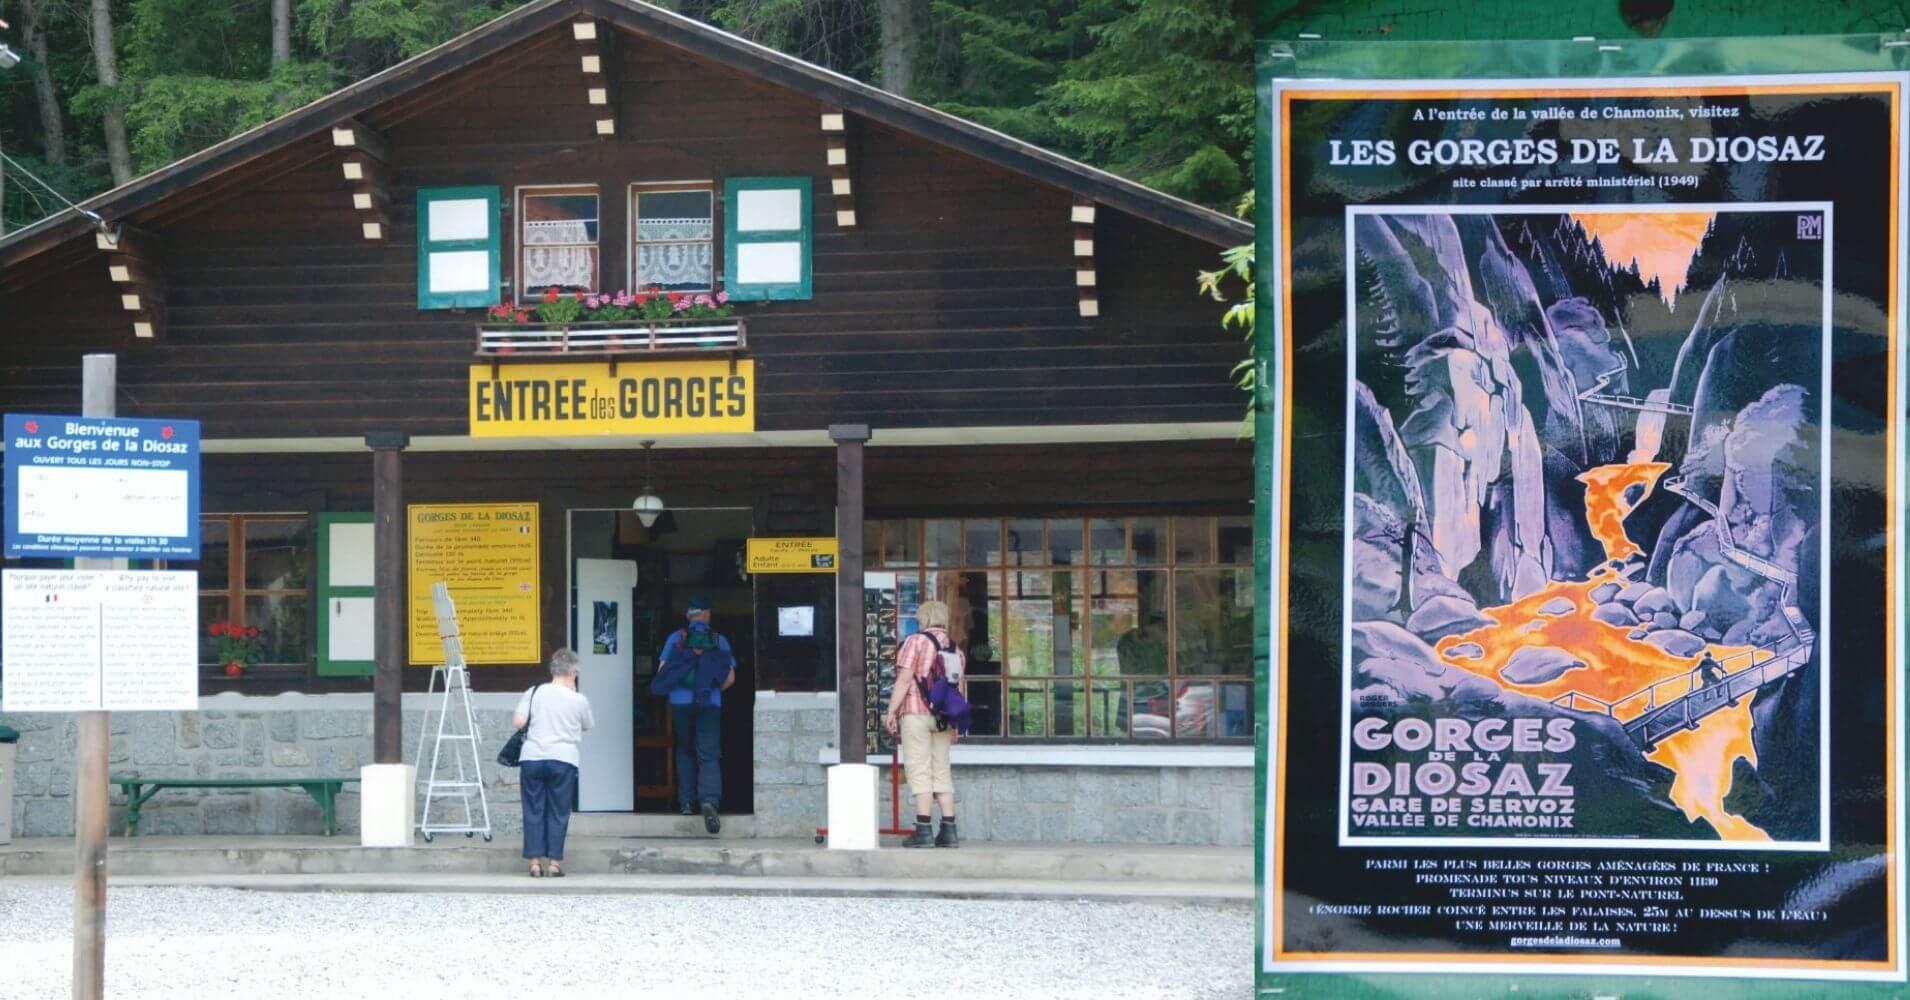 Les Gorges de la Diosaz. Alta Saboya. Auvernia-Ródano-Alpes. Francia.